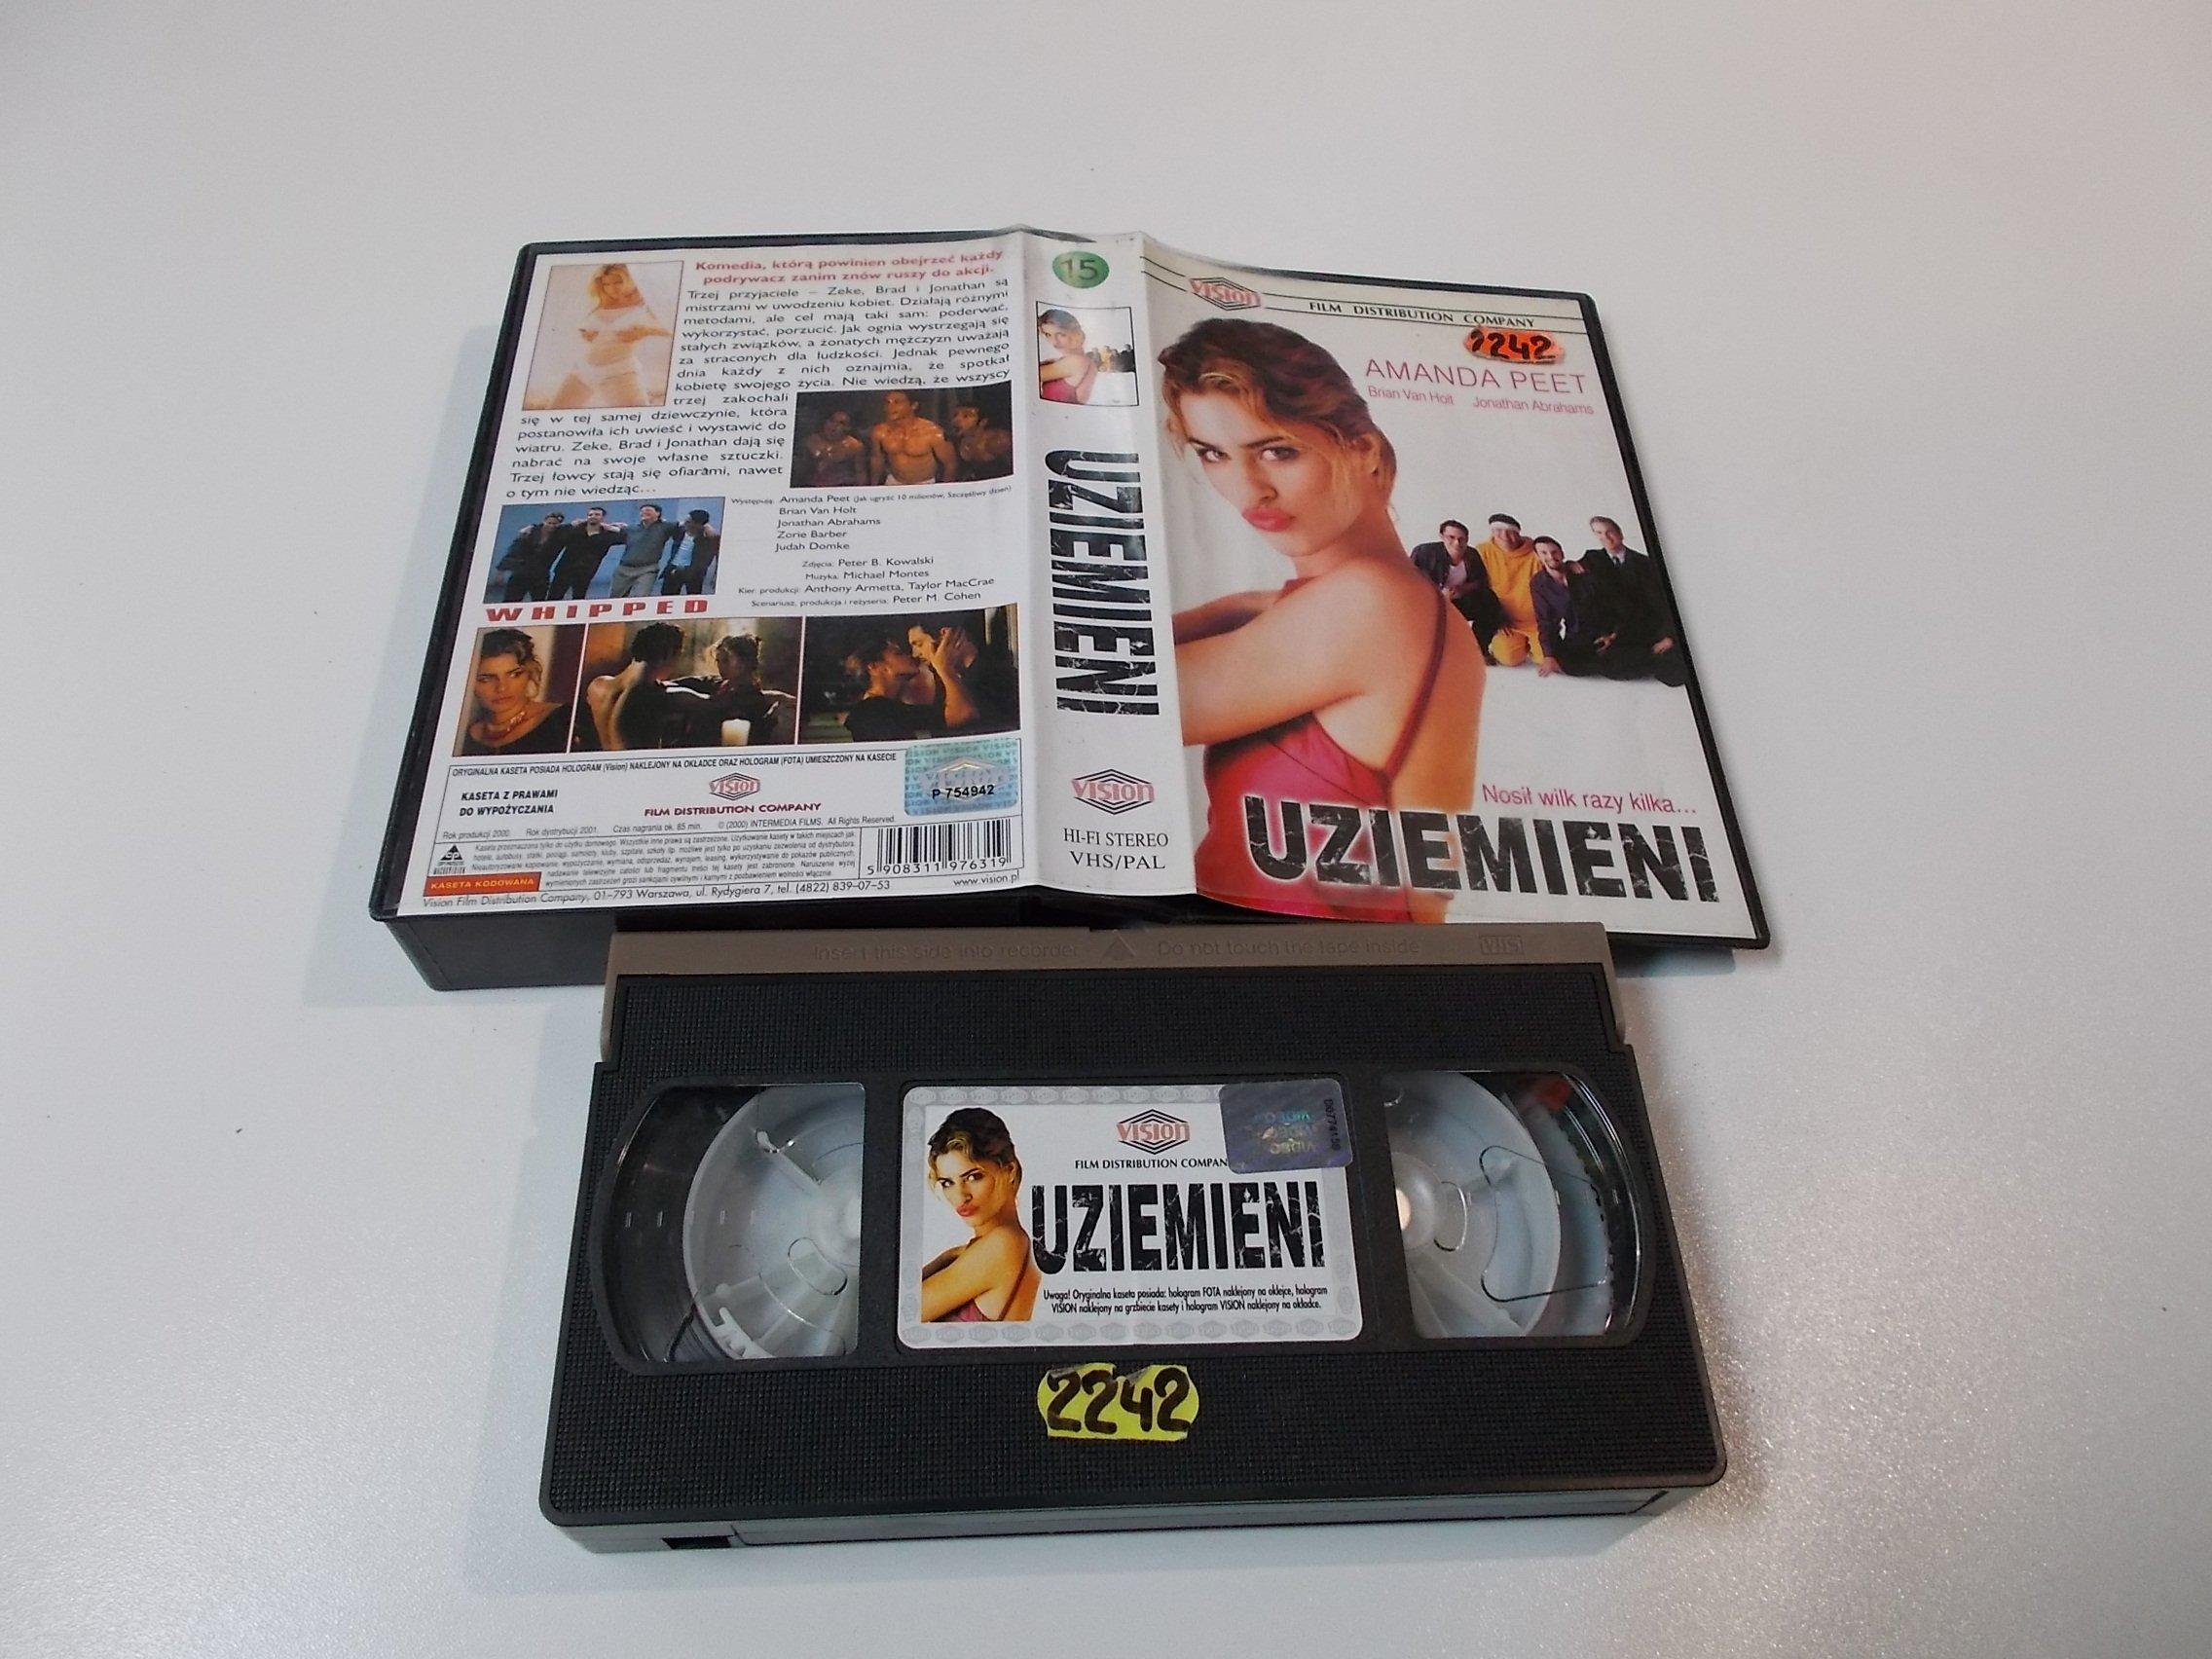 UZIEMIENI - Kaseta Video VHS - Opole 1583